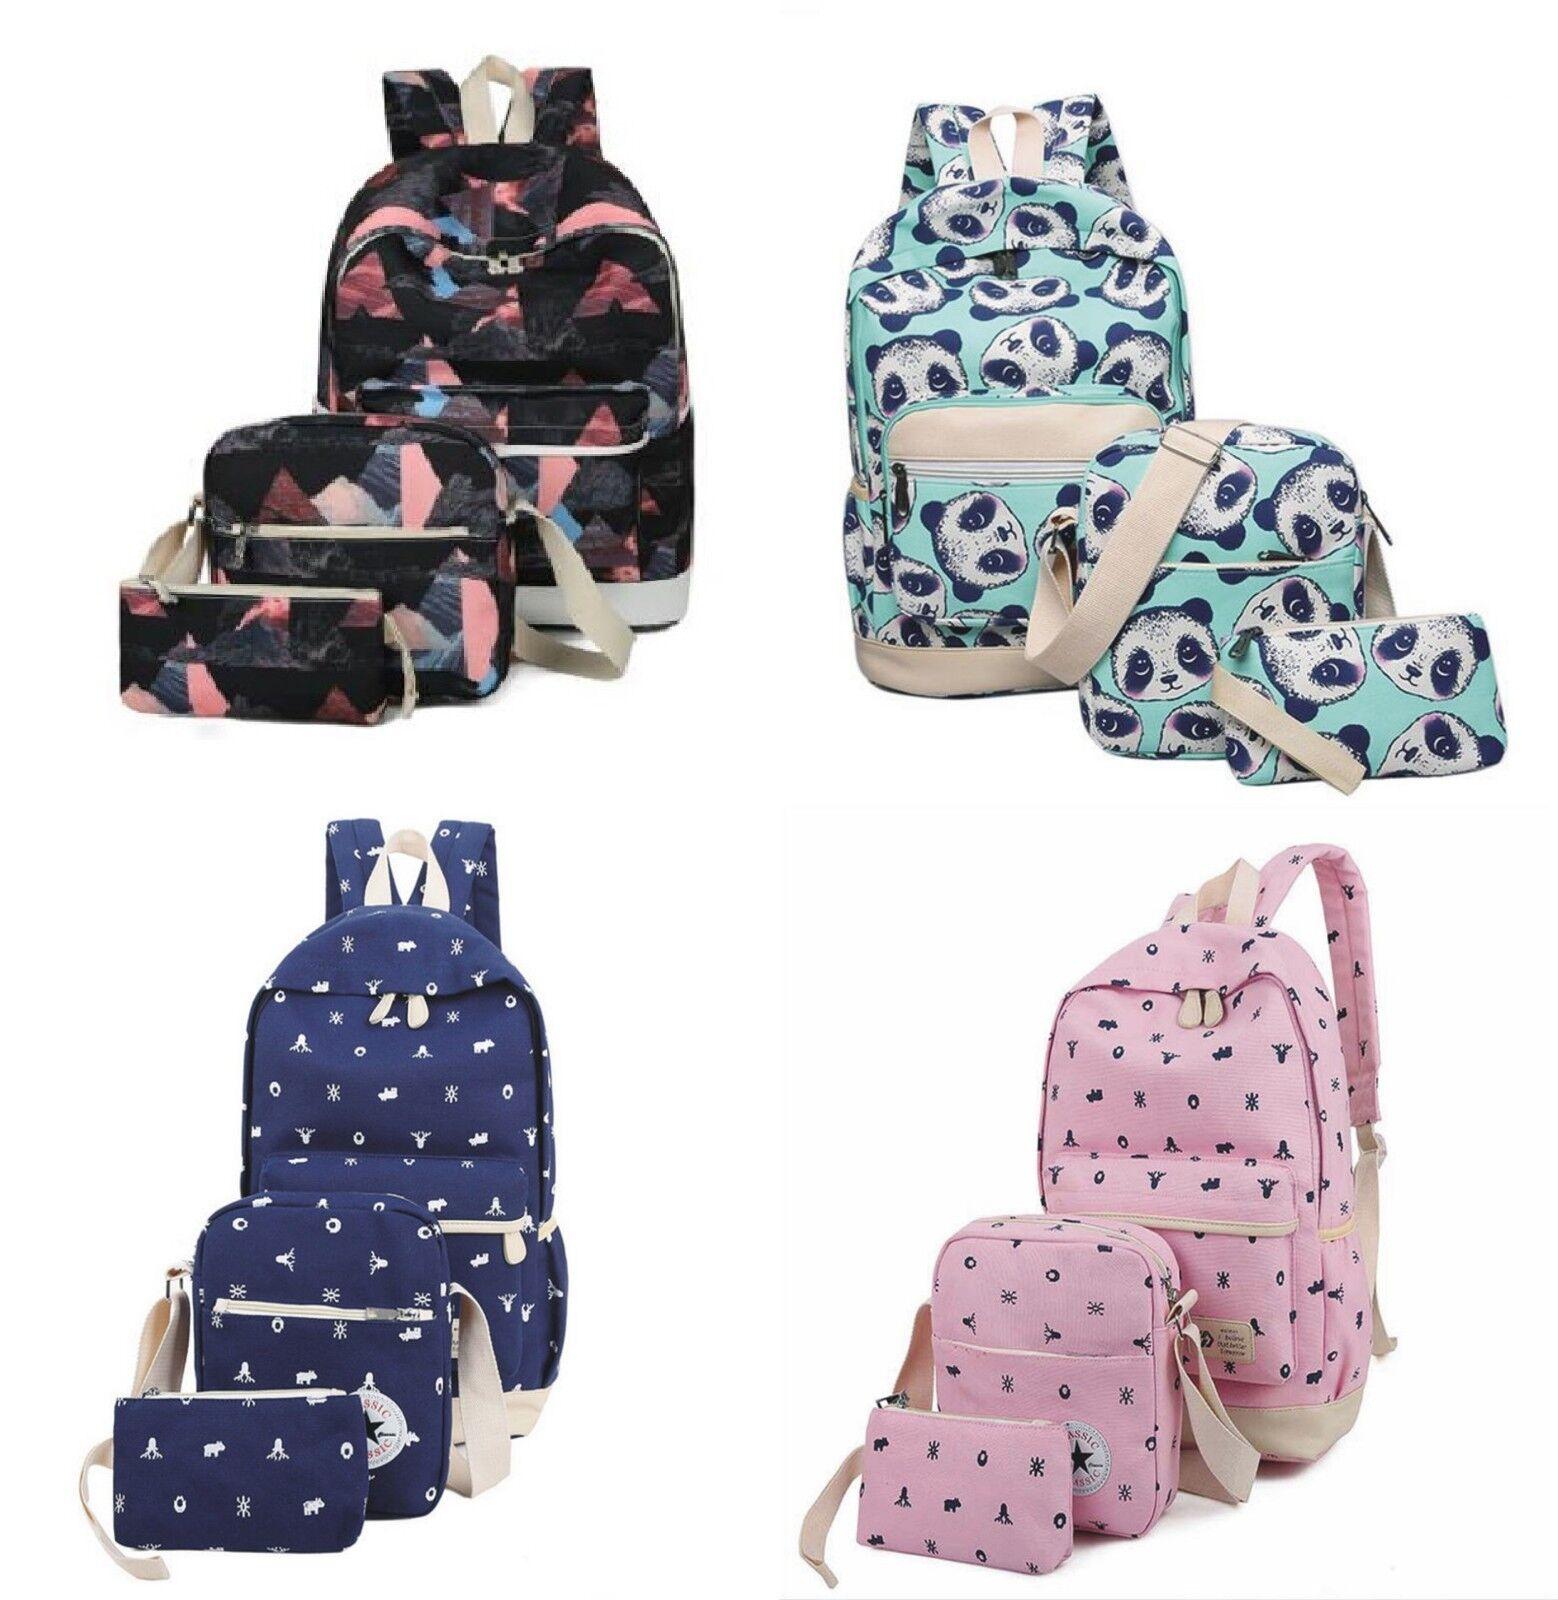 dabd71b223a5 3Pcs/Set Women Girl Canvas Backpack Laptop School Shoulder Bag Travel Book  Bags